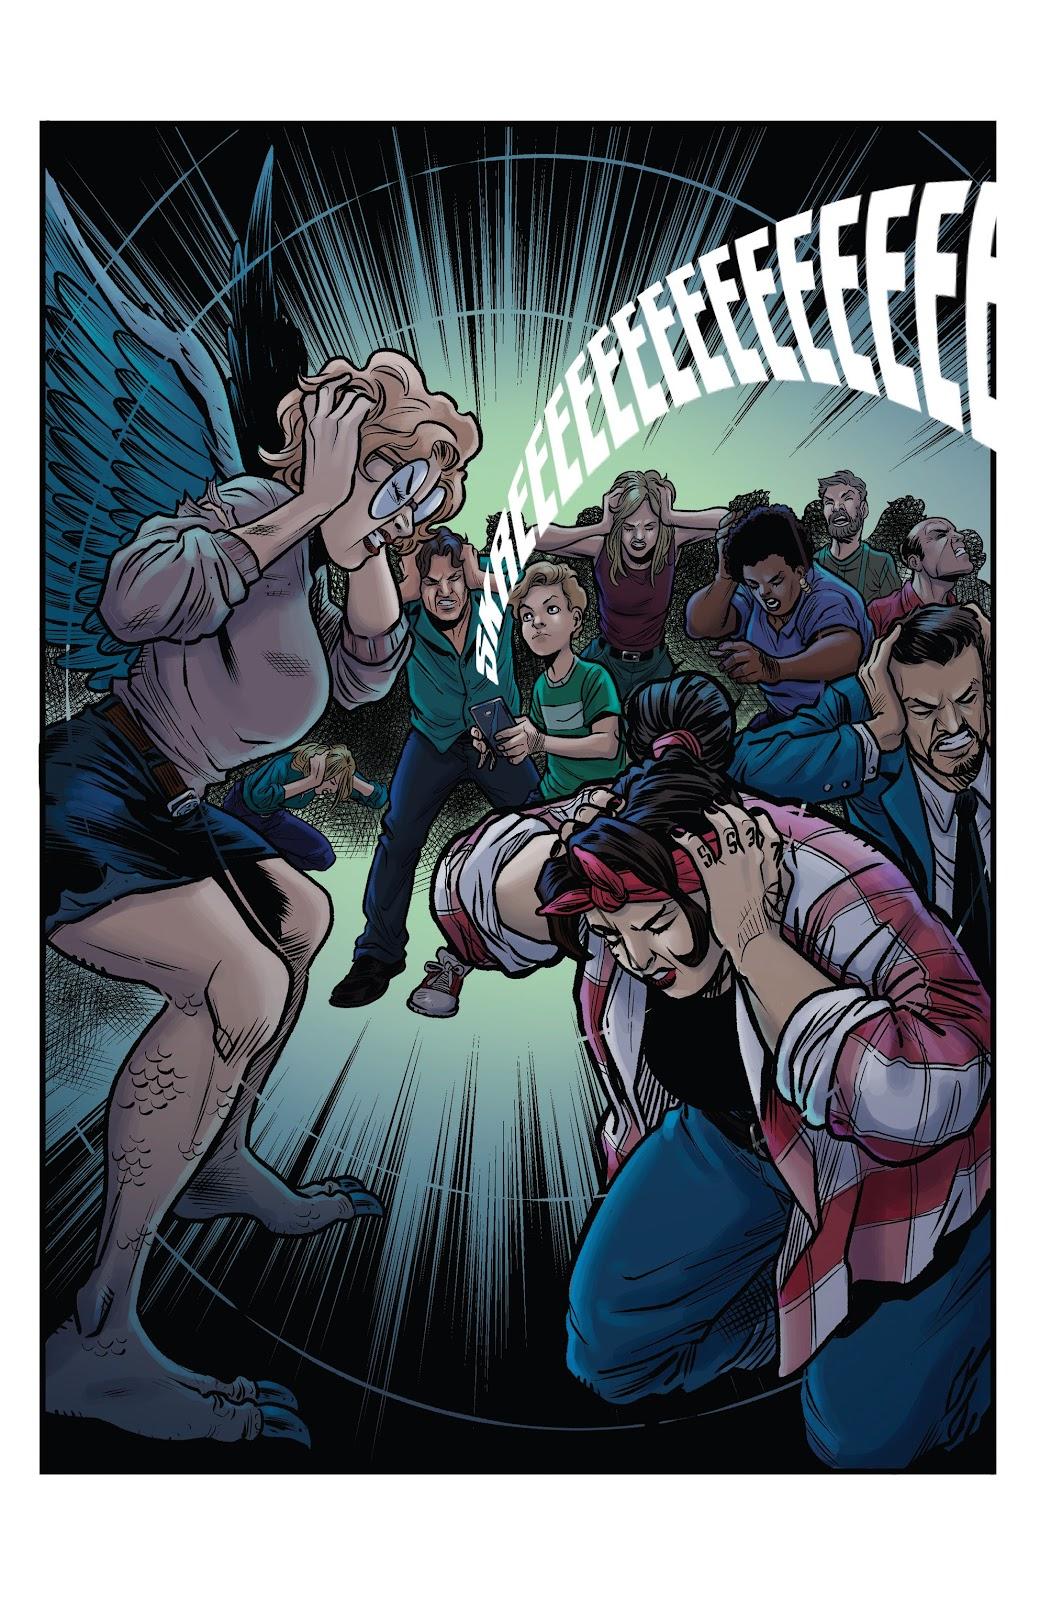 Read online Black Betty comic -  Issue #8 - 7